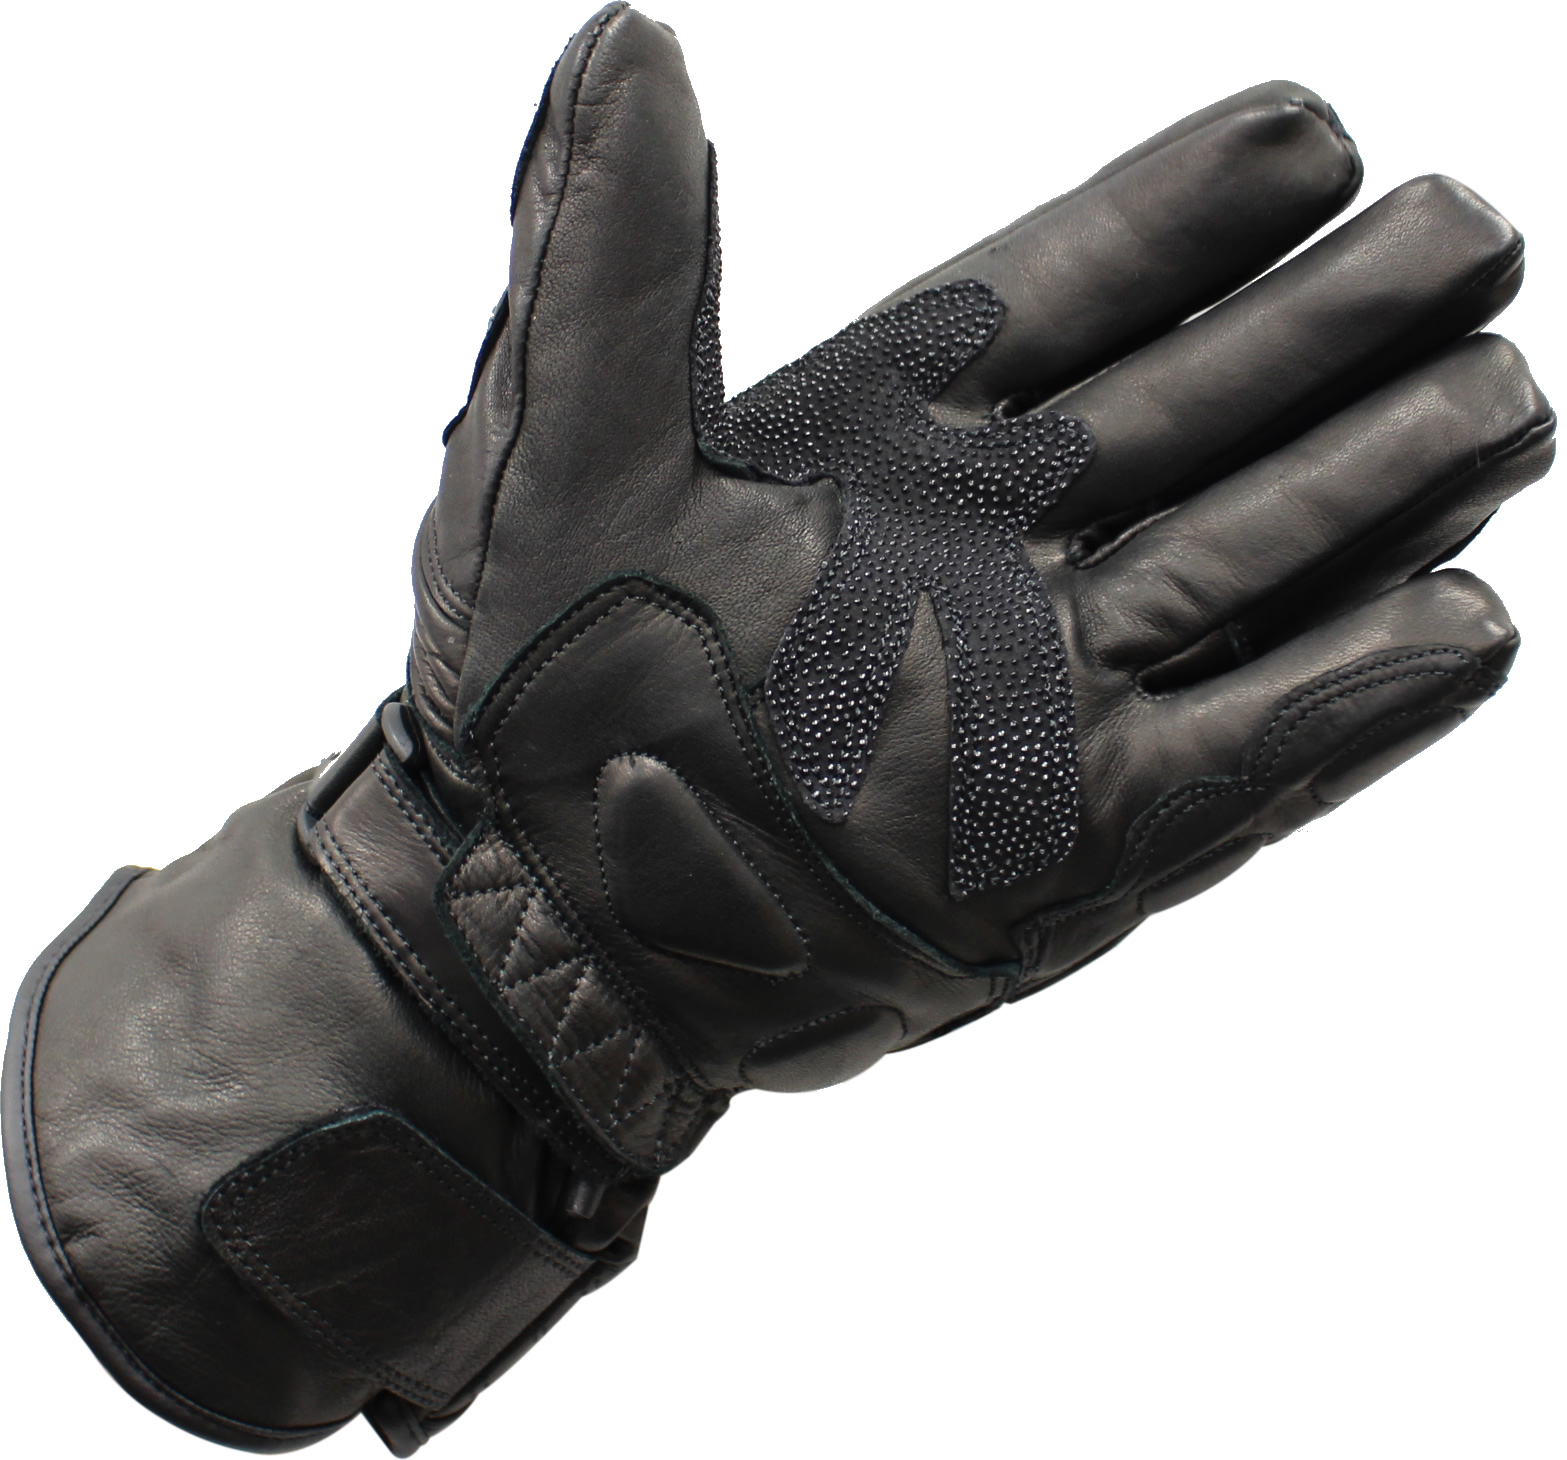 5287-Black-Element-Glove-Black-1600-2